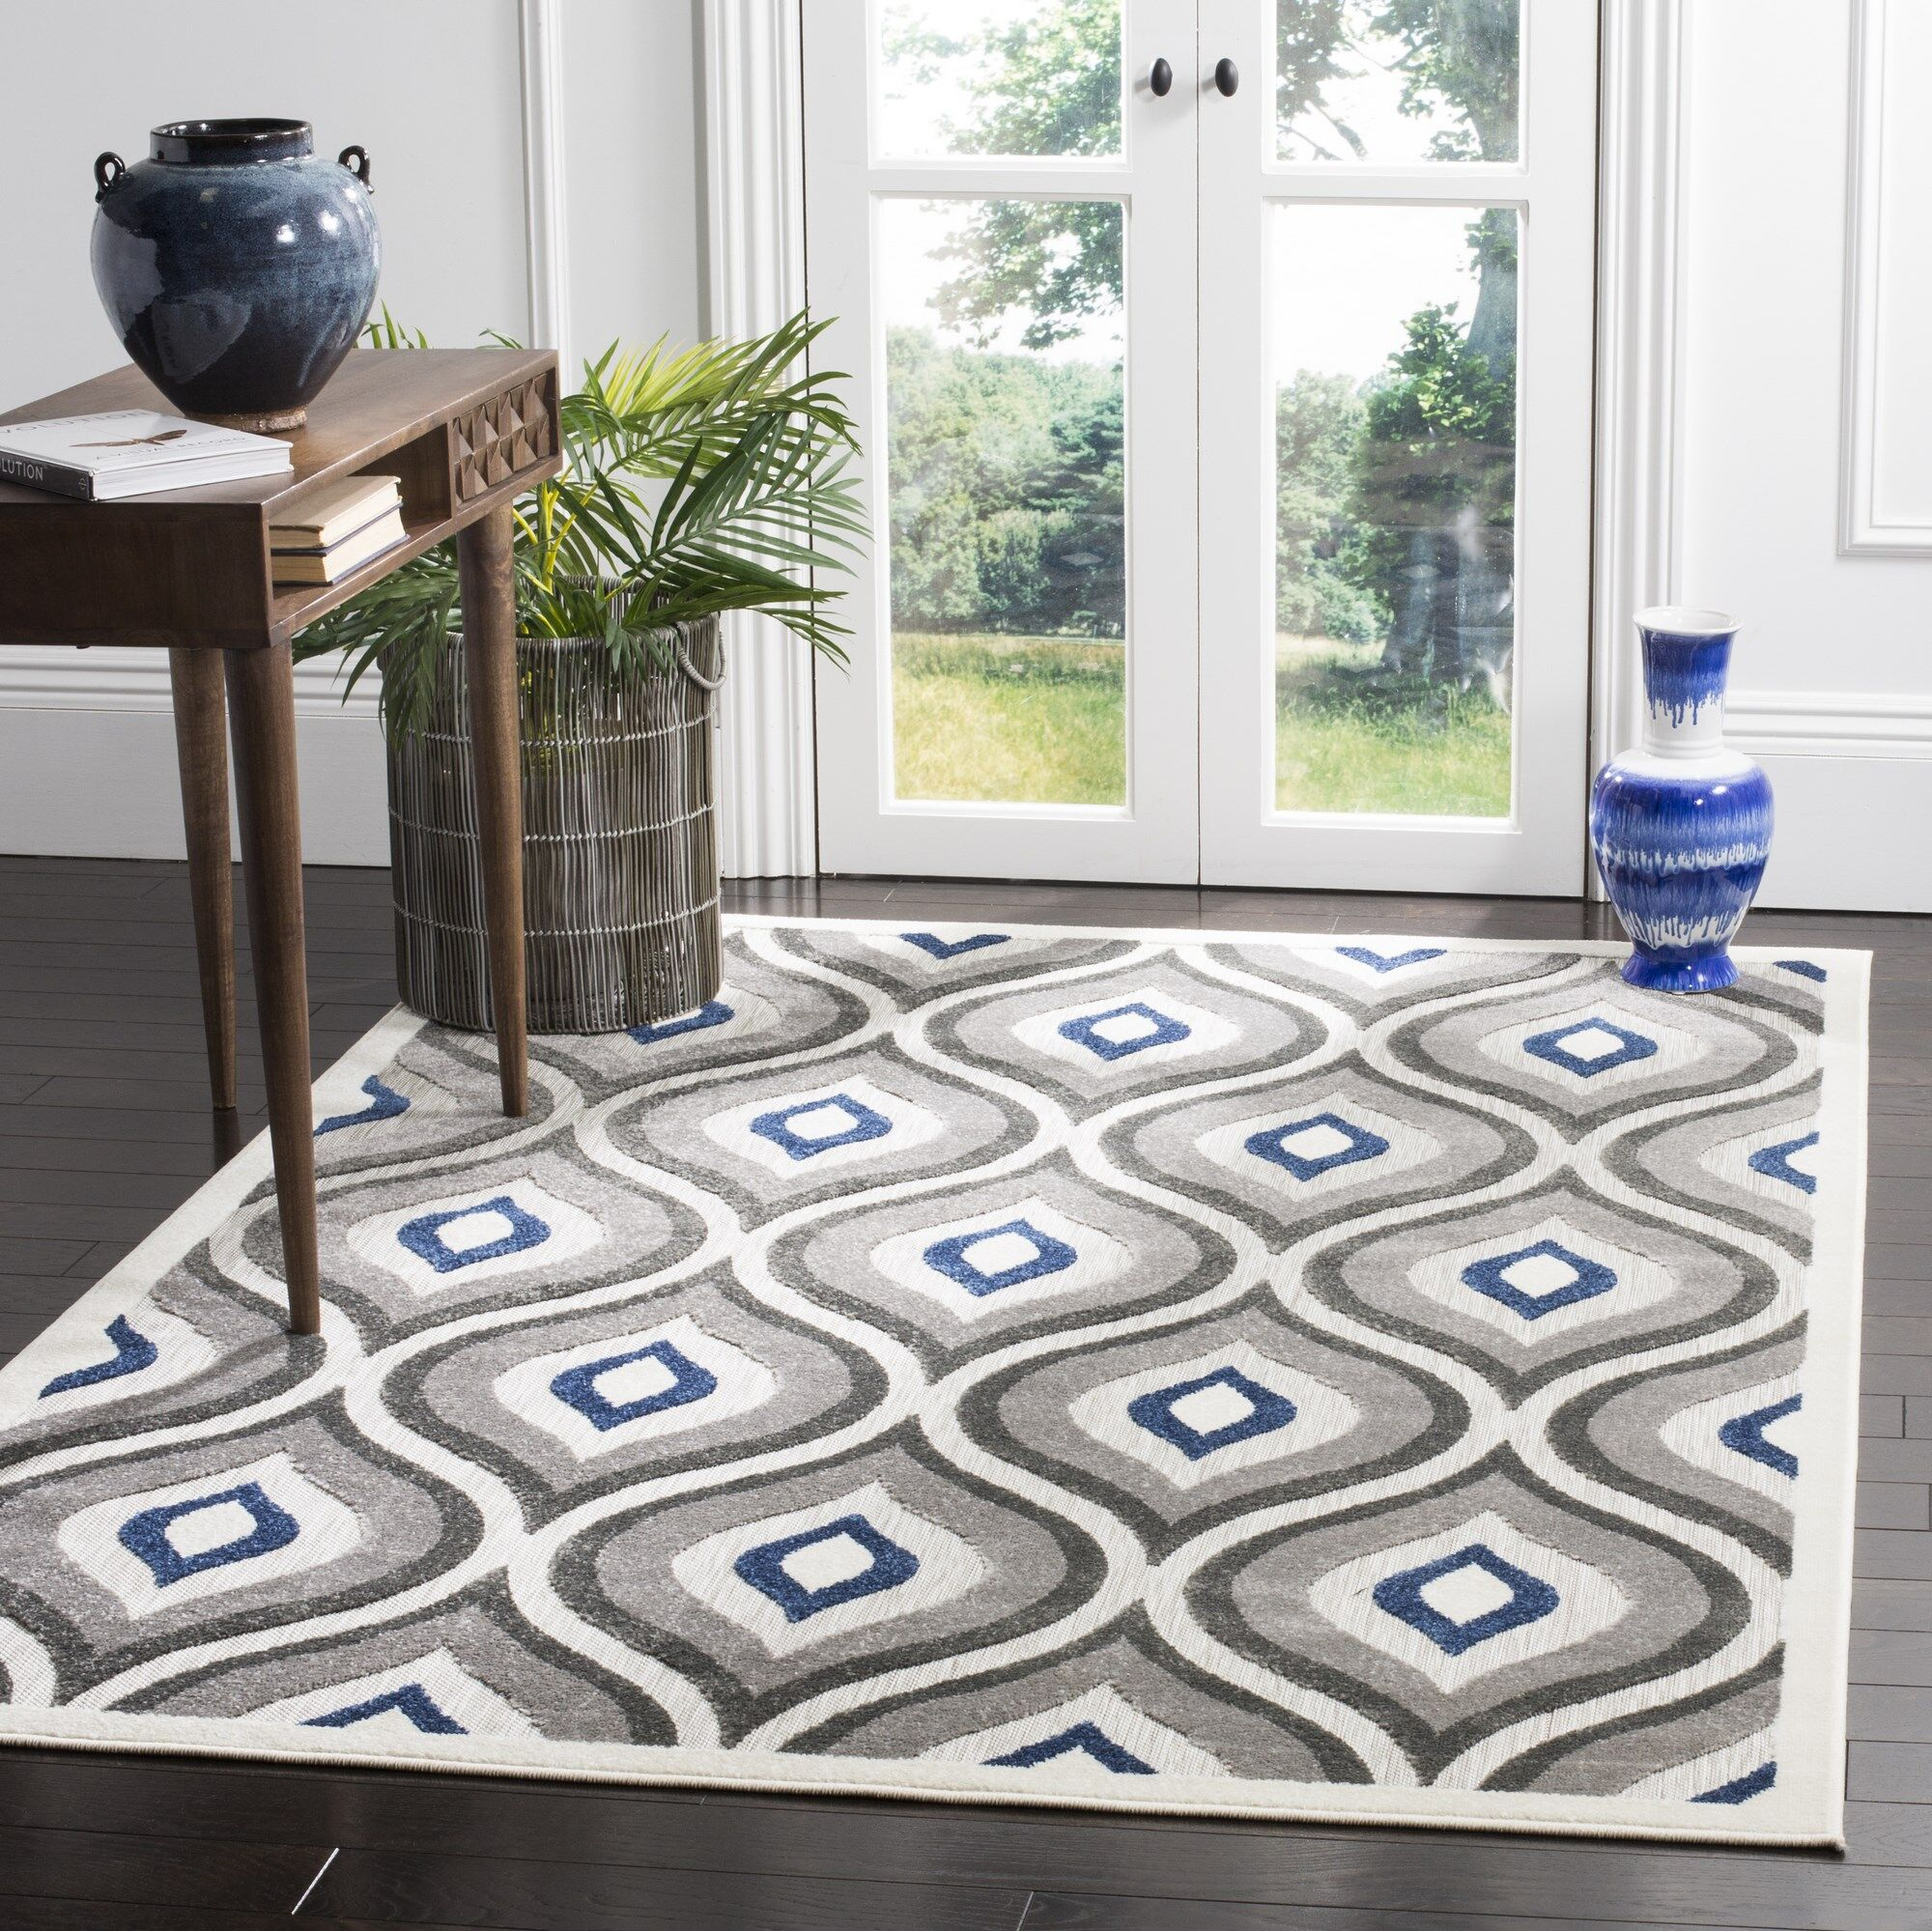 Evans Gray/Royal Area Rug Rug Size: Rectangle 8' x 11'2